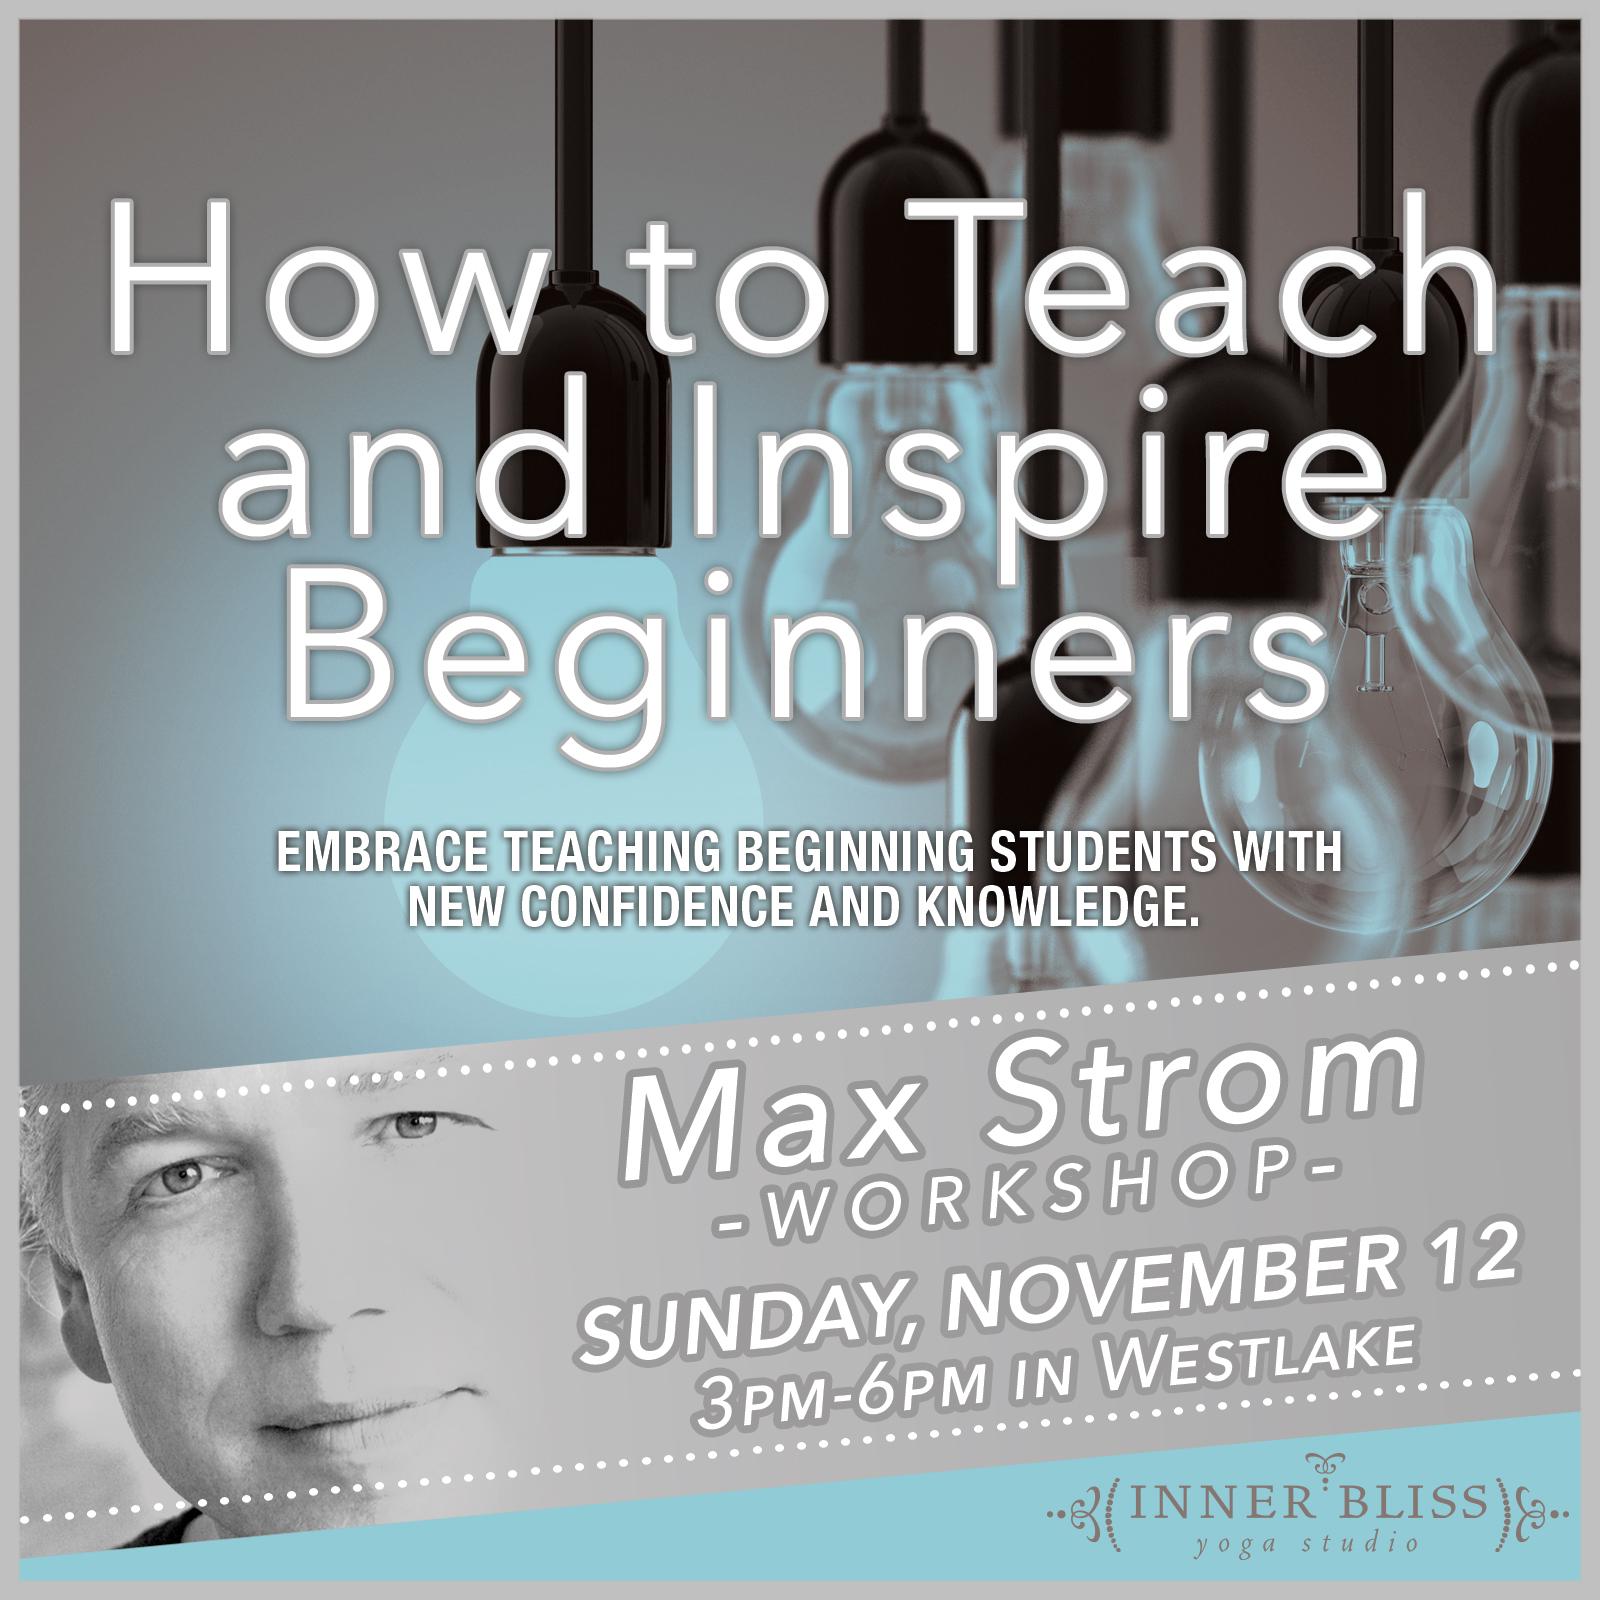 iby-max-strom-teaching-beginners.jpg